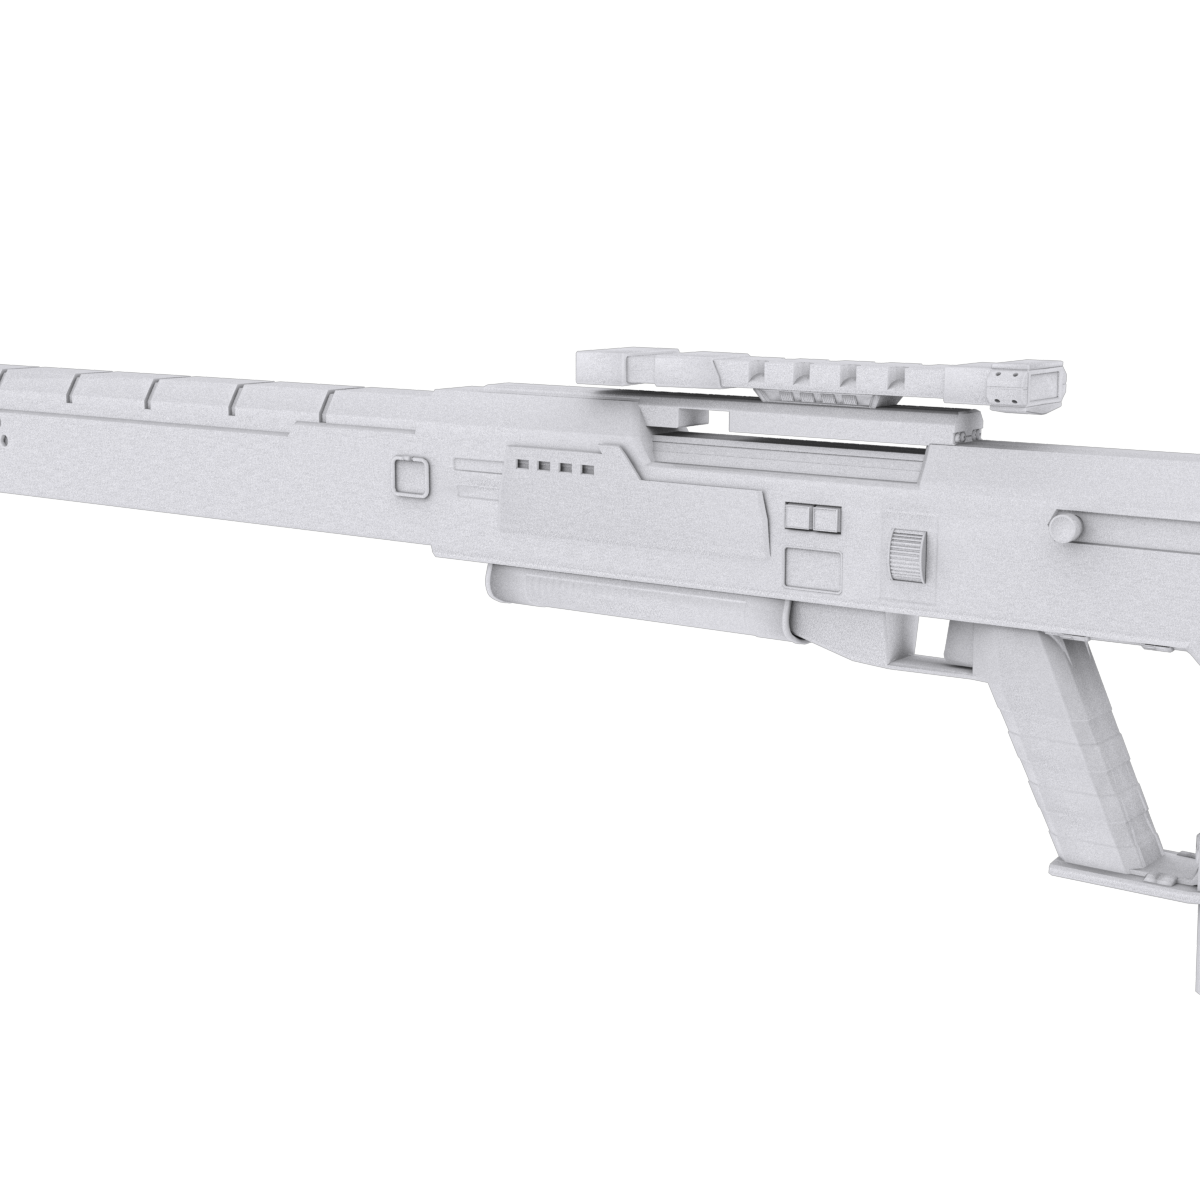 Moretti SR4 3D model